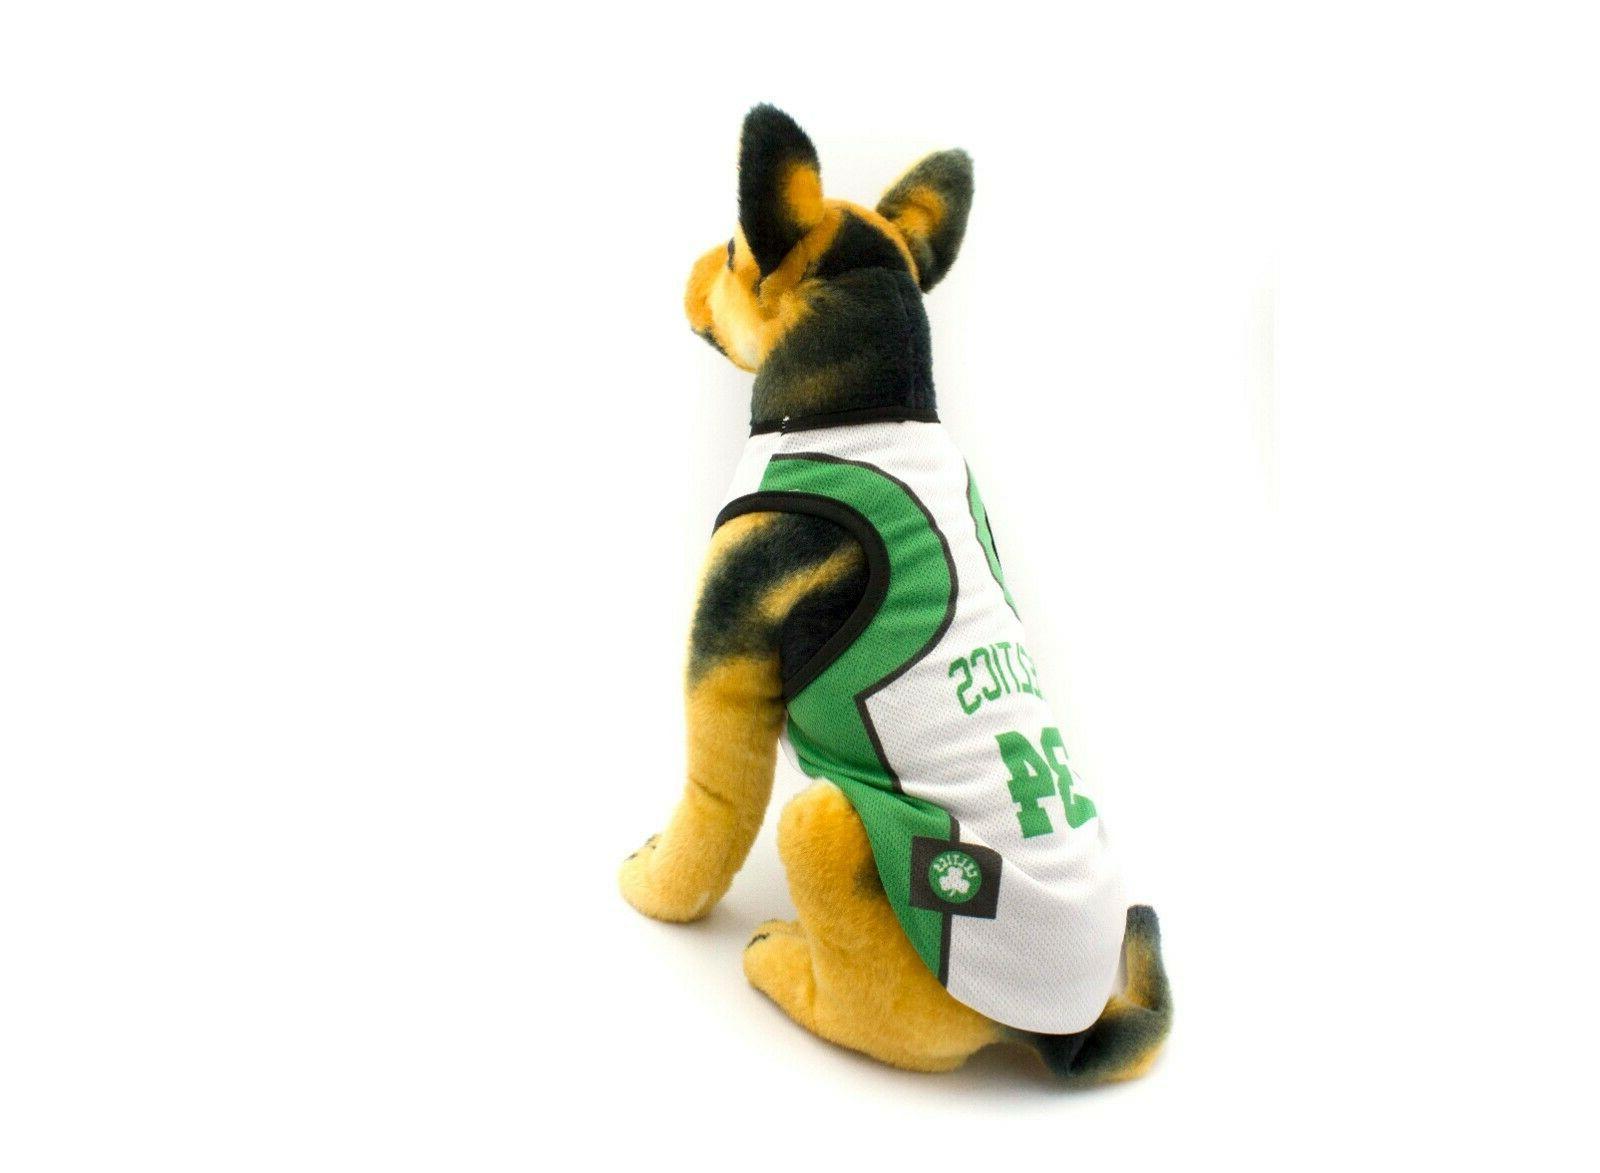 AXEL PETS NBA Basketball Boston Celtics Sporty Team Jersey